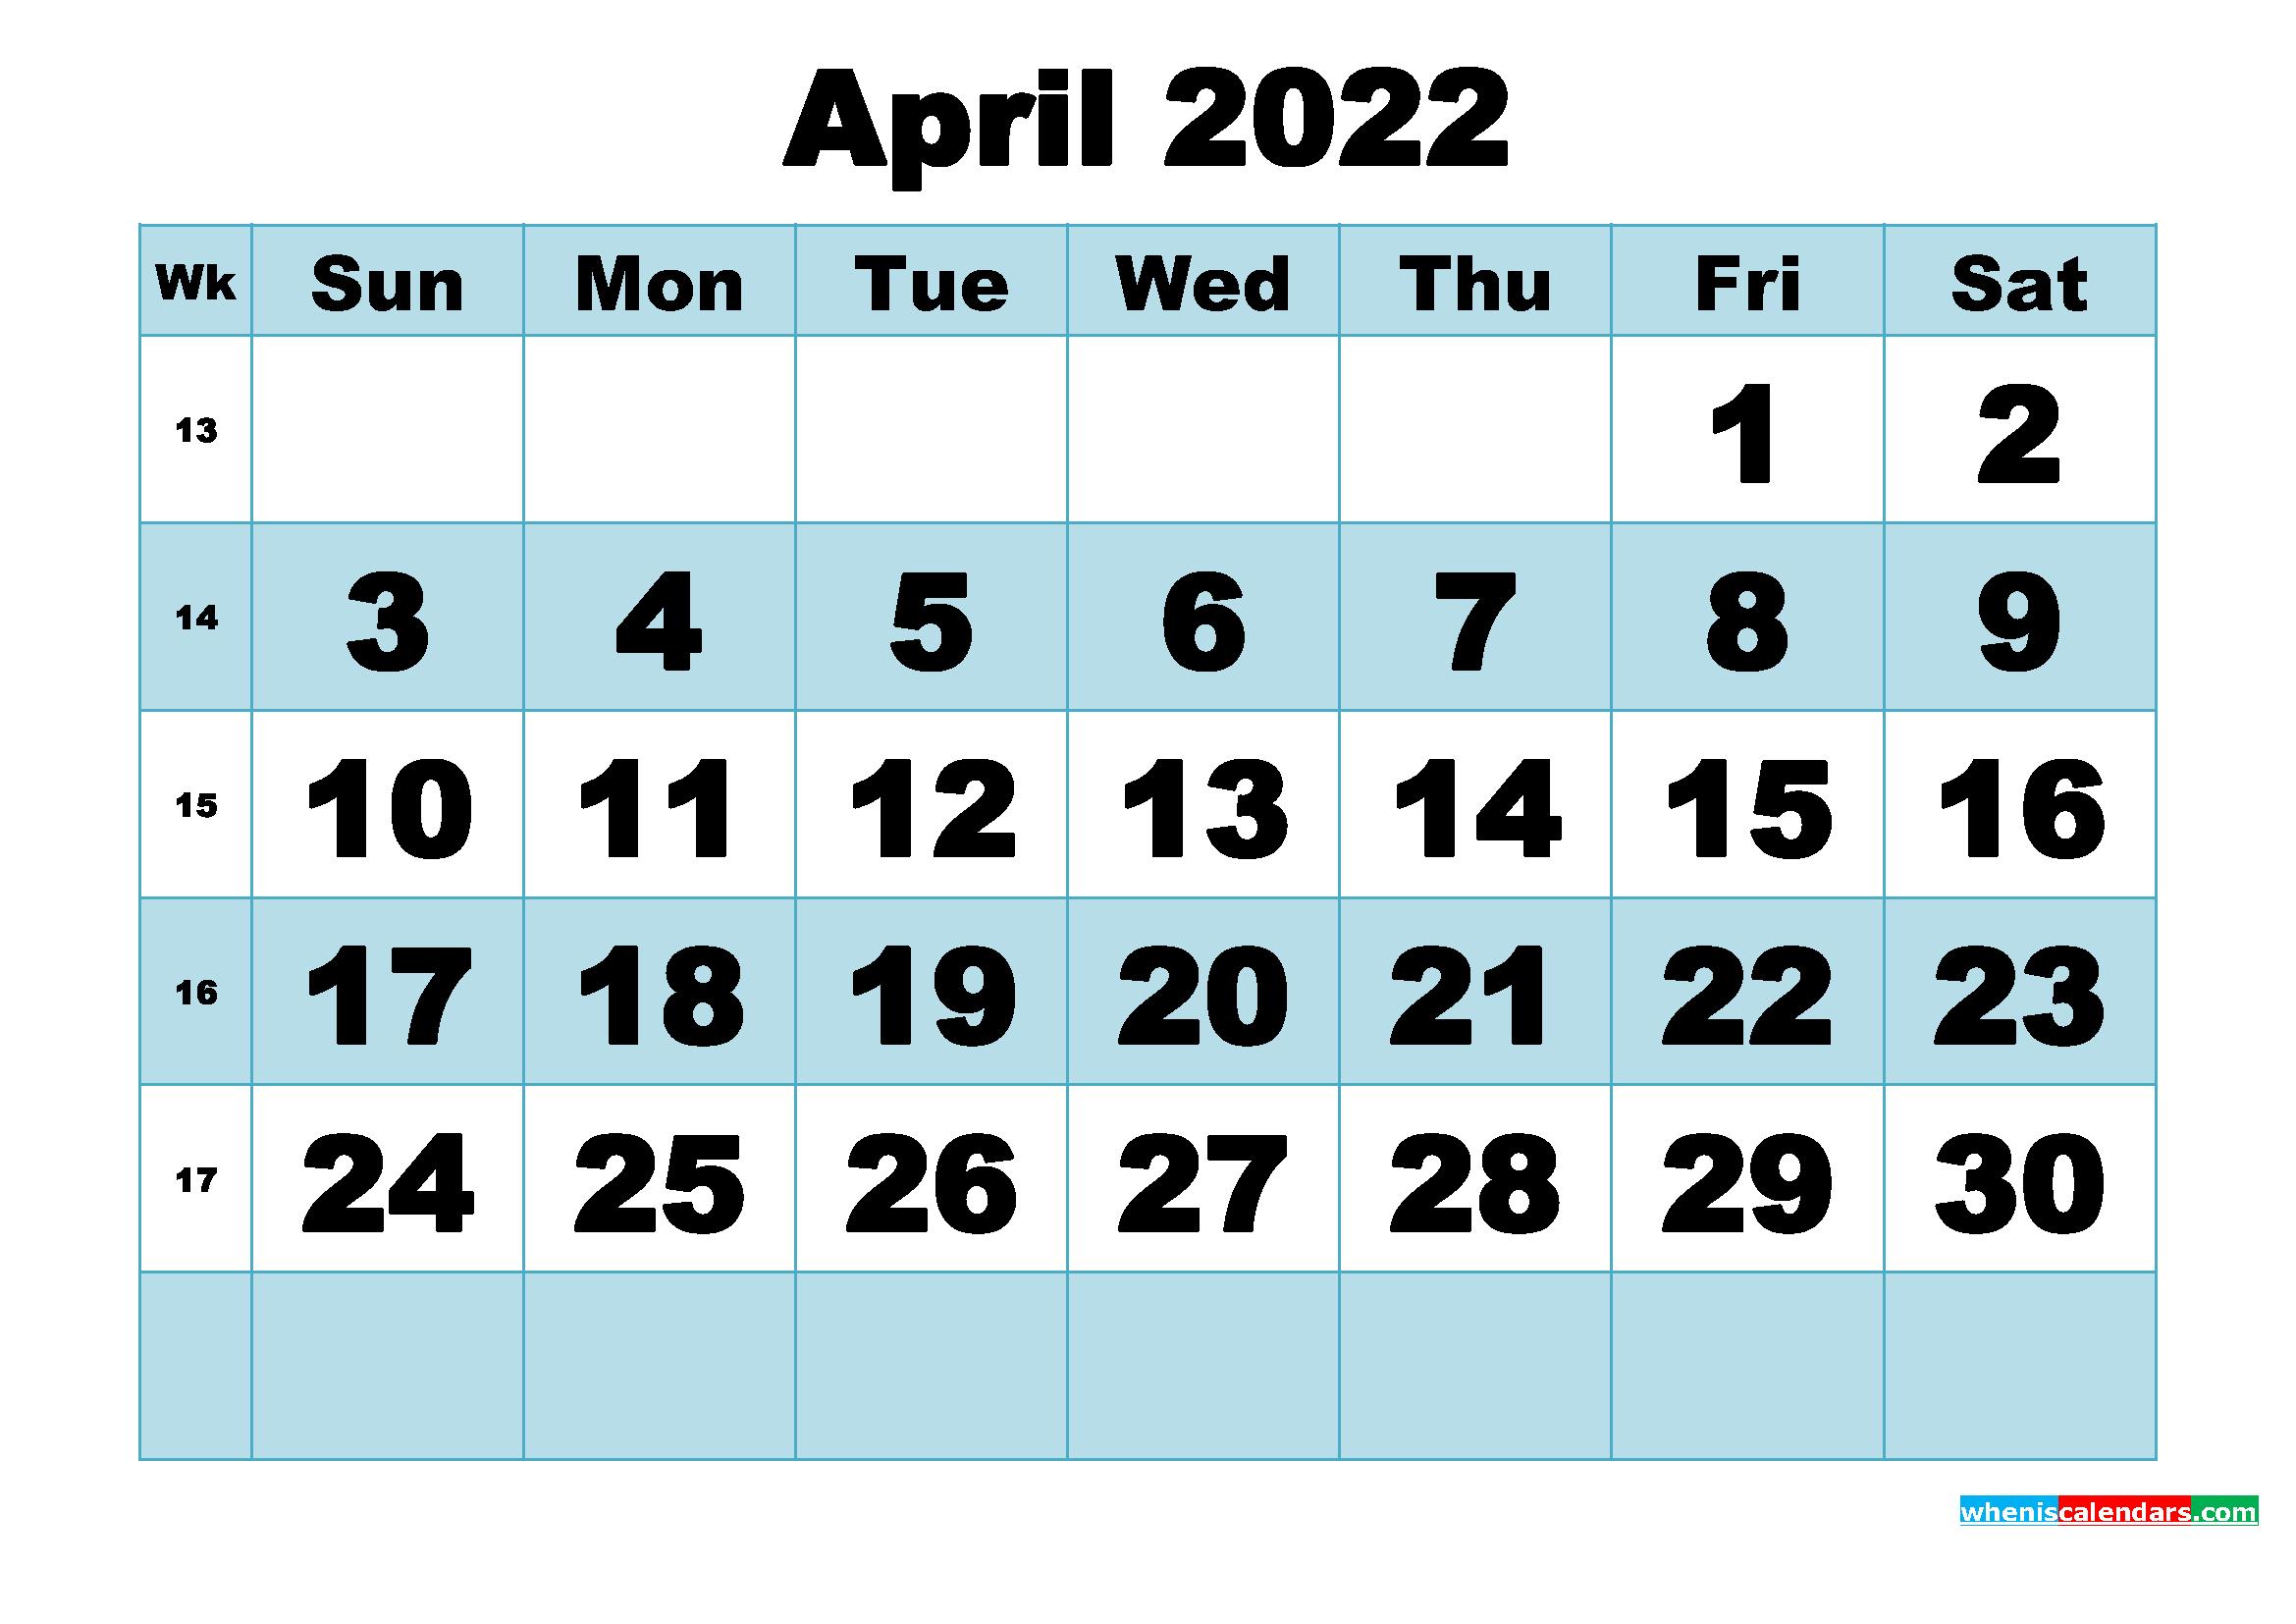 Free Printable April 2022 Calendar Word, Pdf, Image intended for April Calendar 2022 Free Printable Graphics